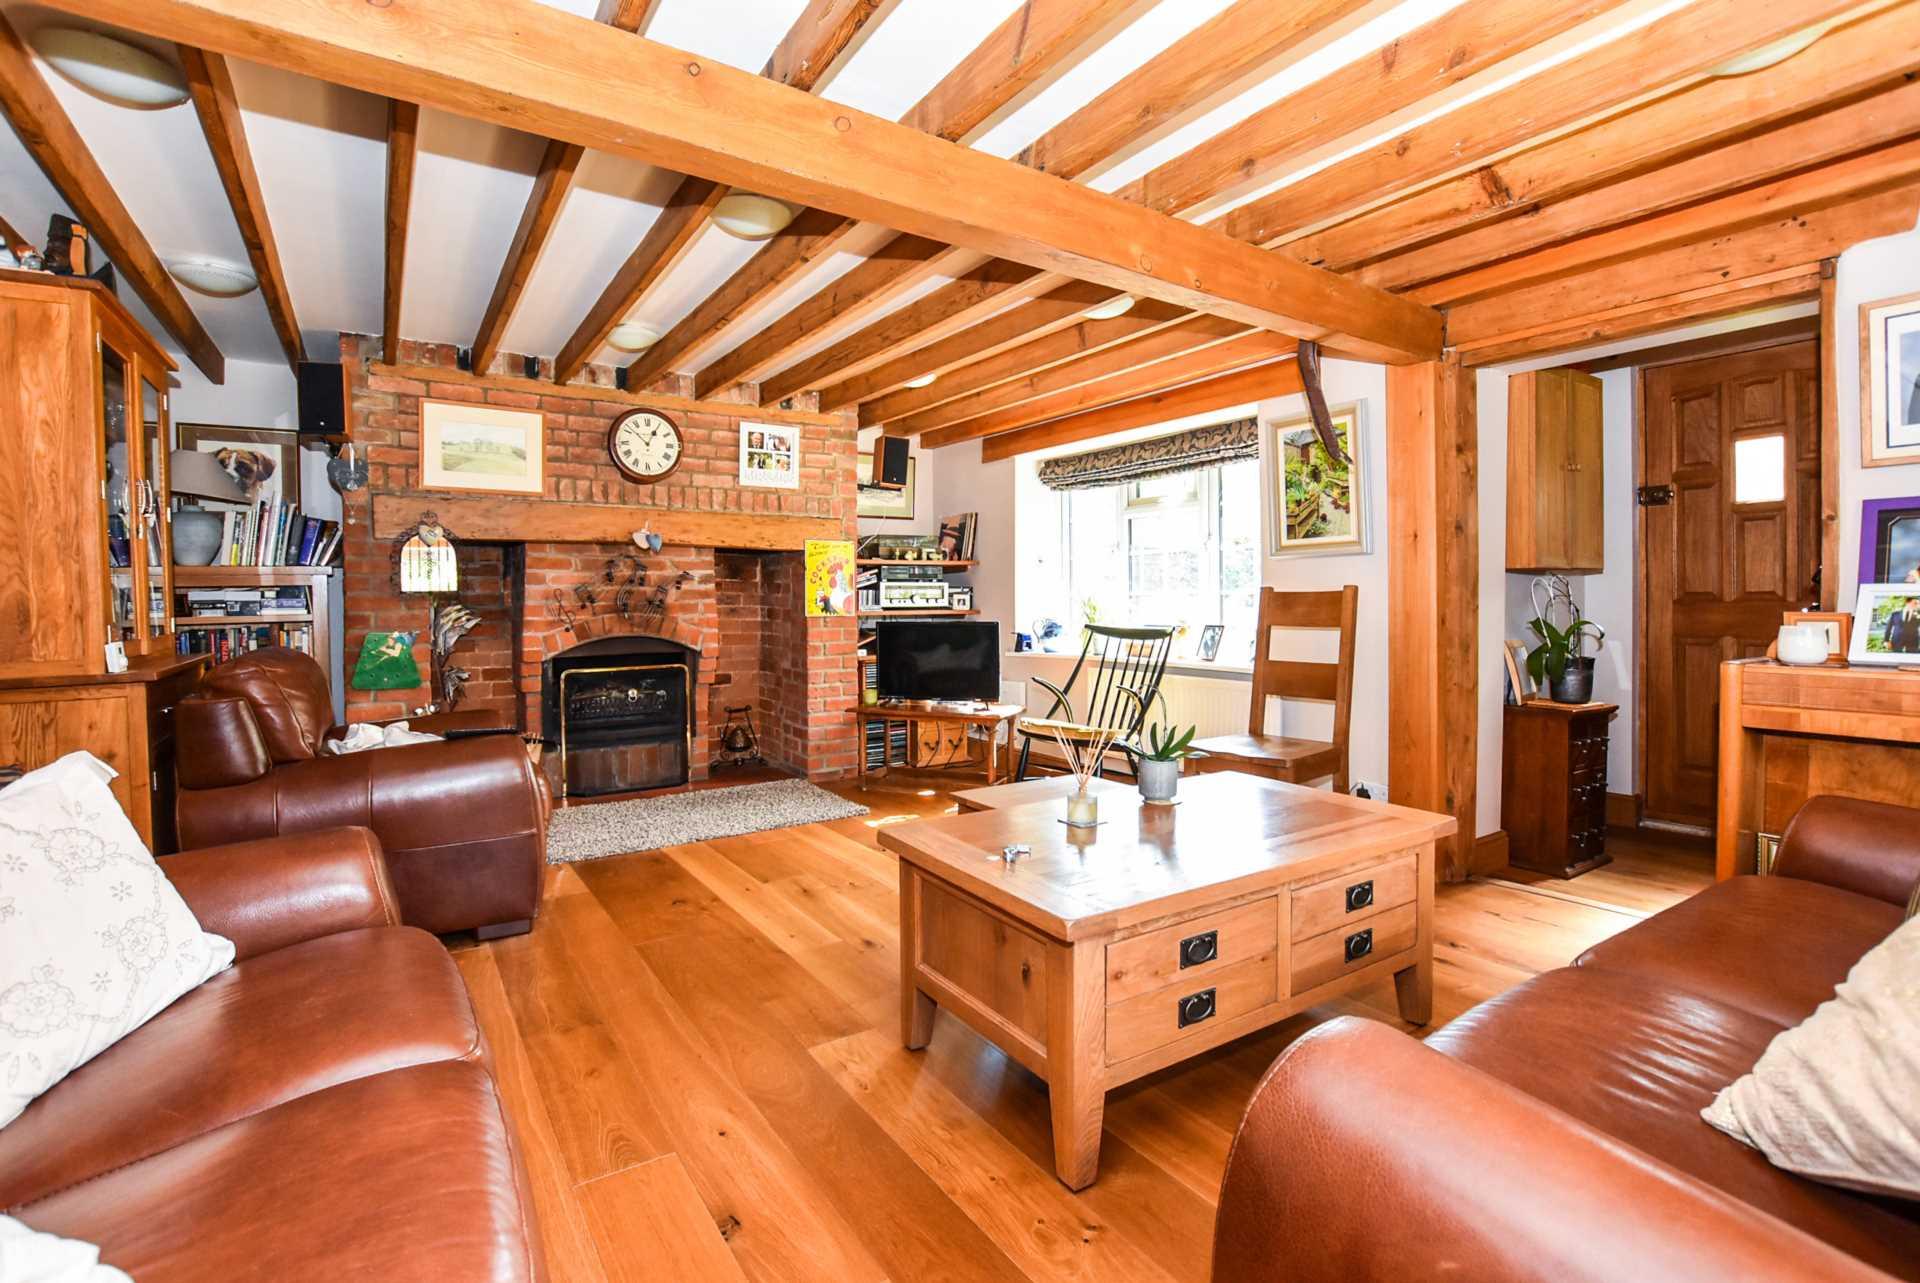 Fullamoor Cottages, Clifton Hampden, Image 6